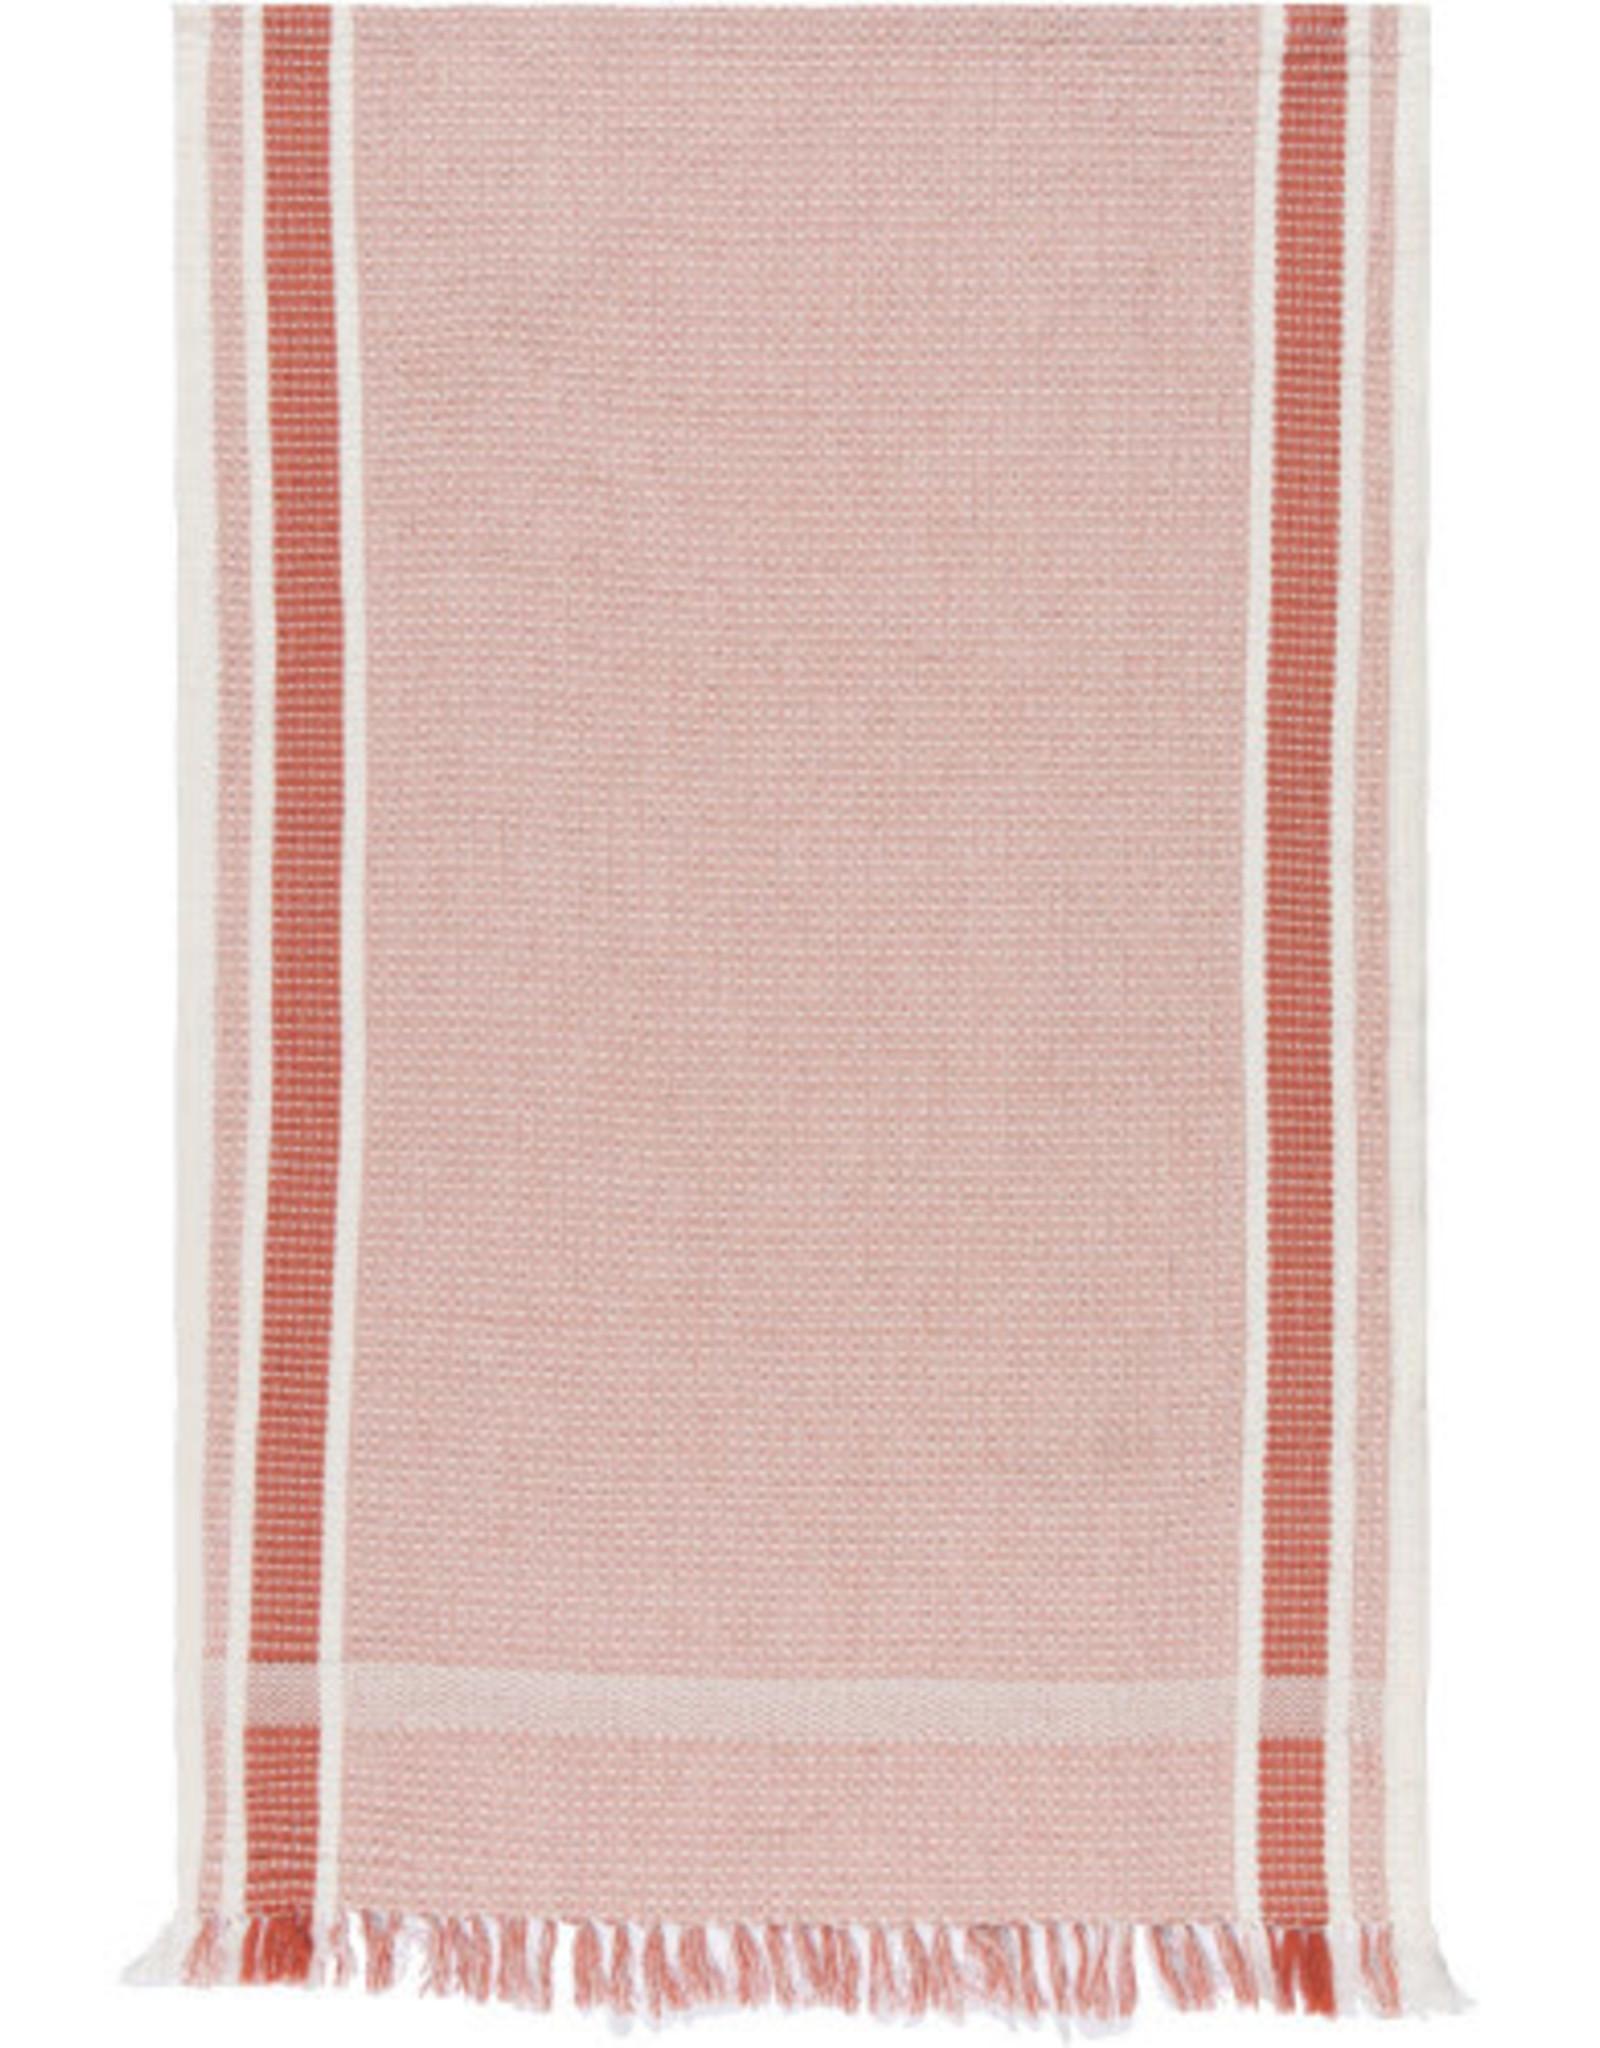 Danica Danica | soft waffle towel